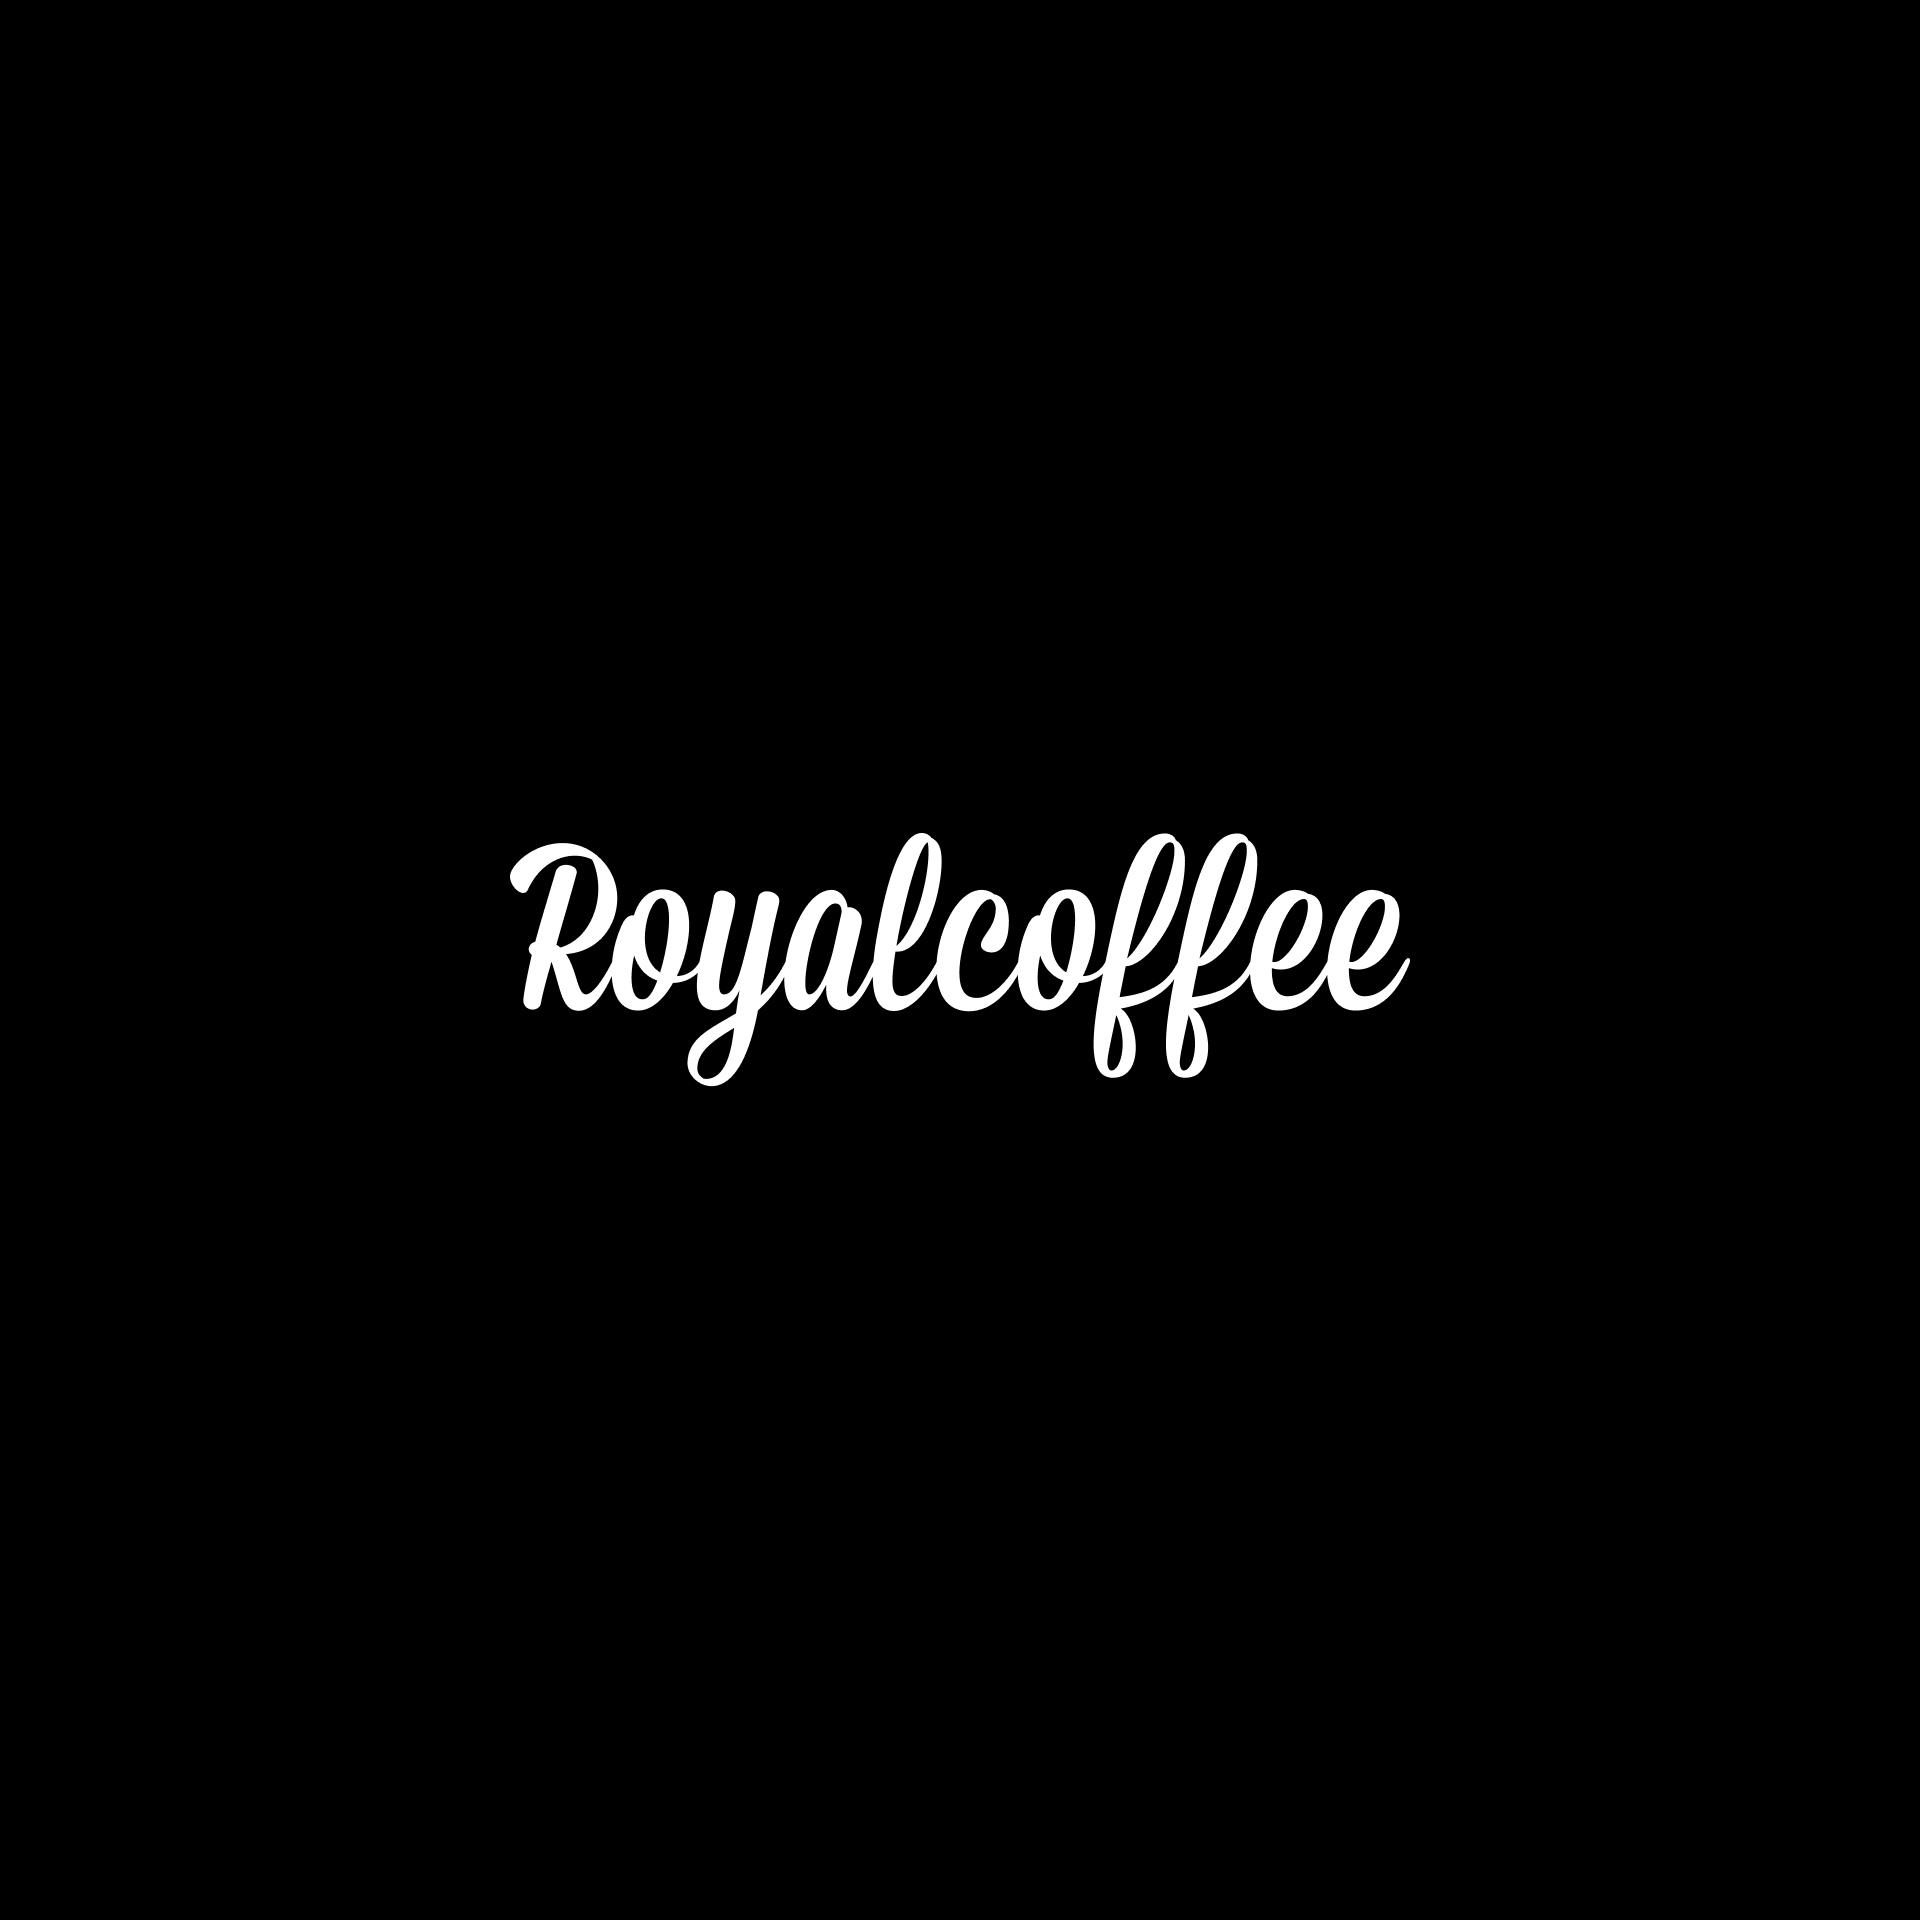 Royal coffee